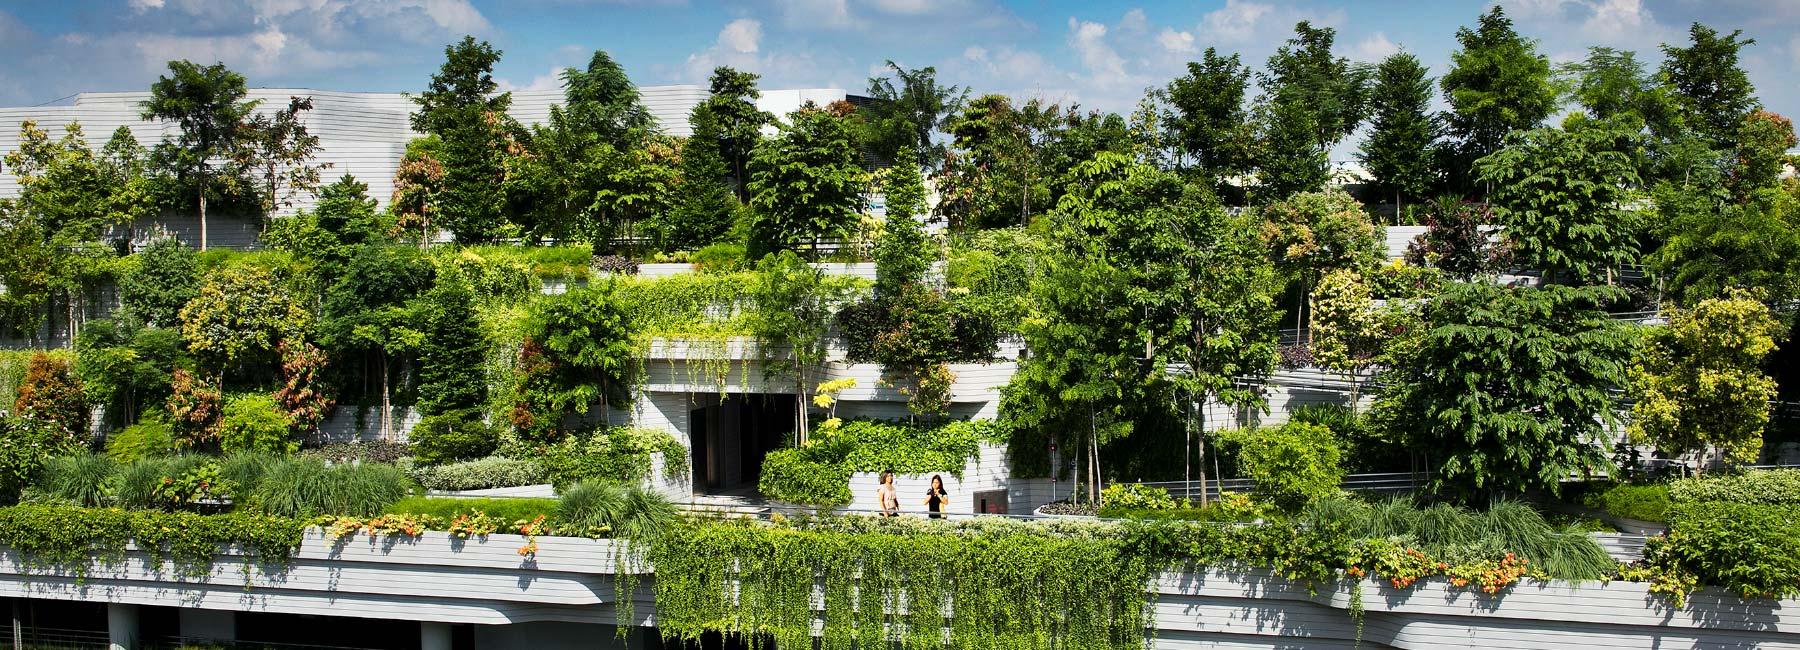 Zgrada prekrivena zelenim slojem